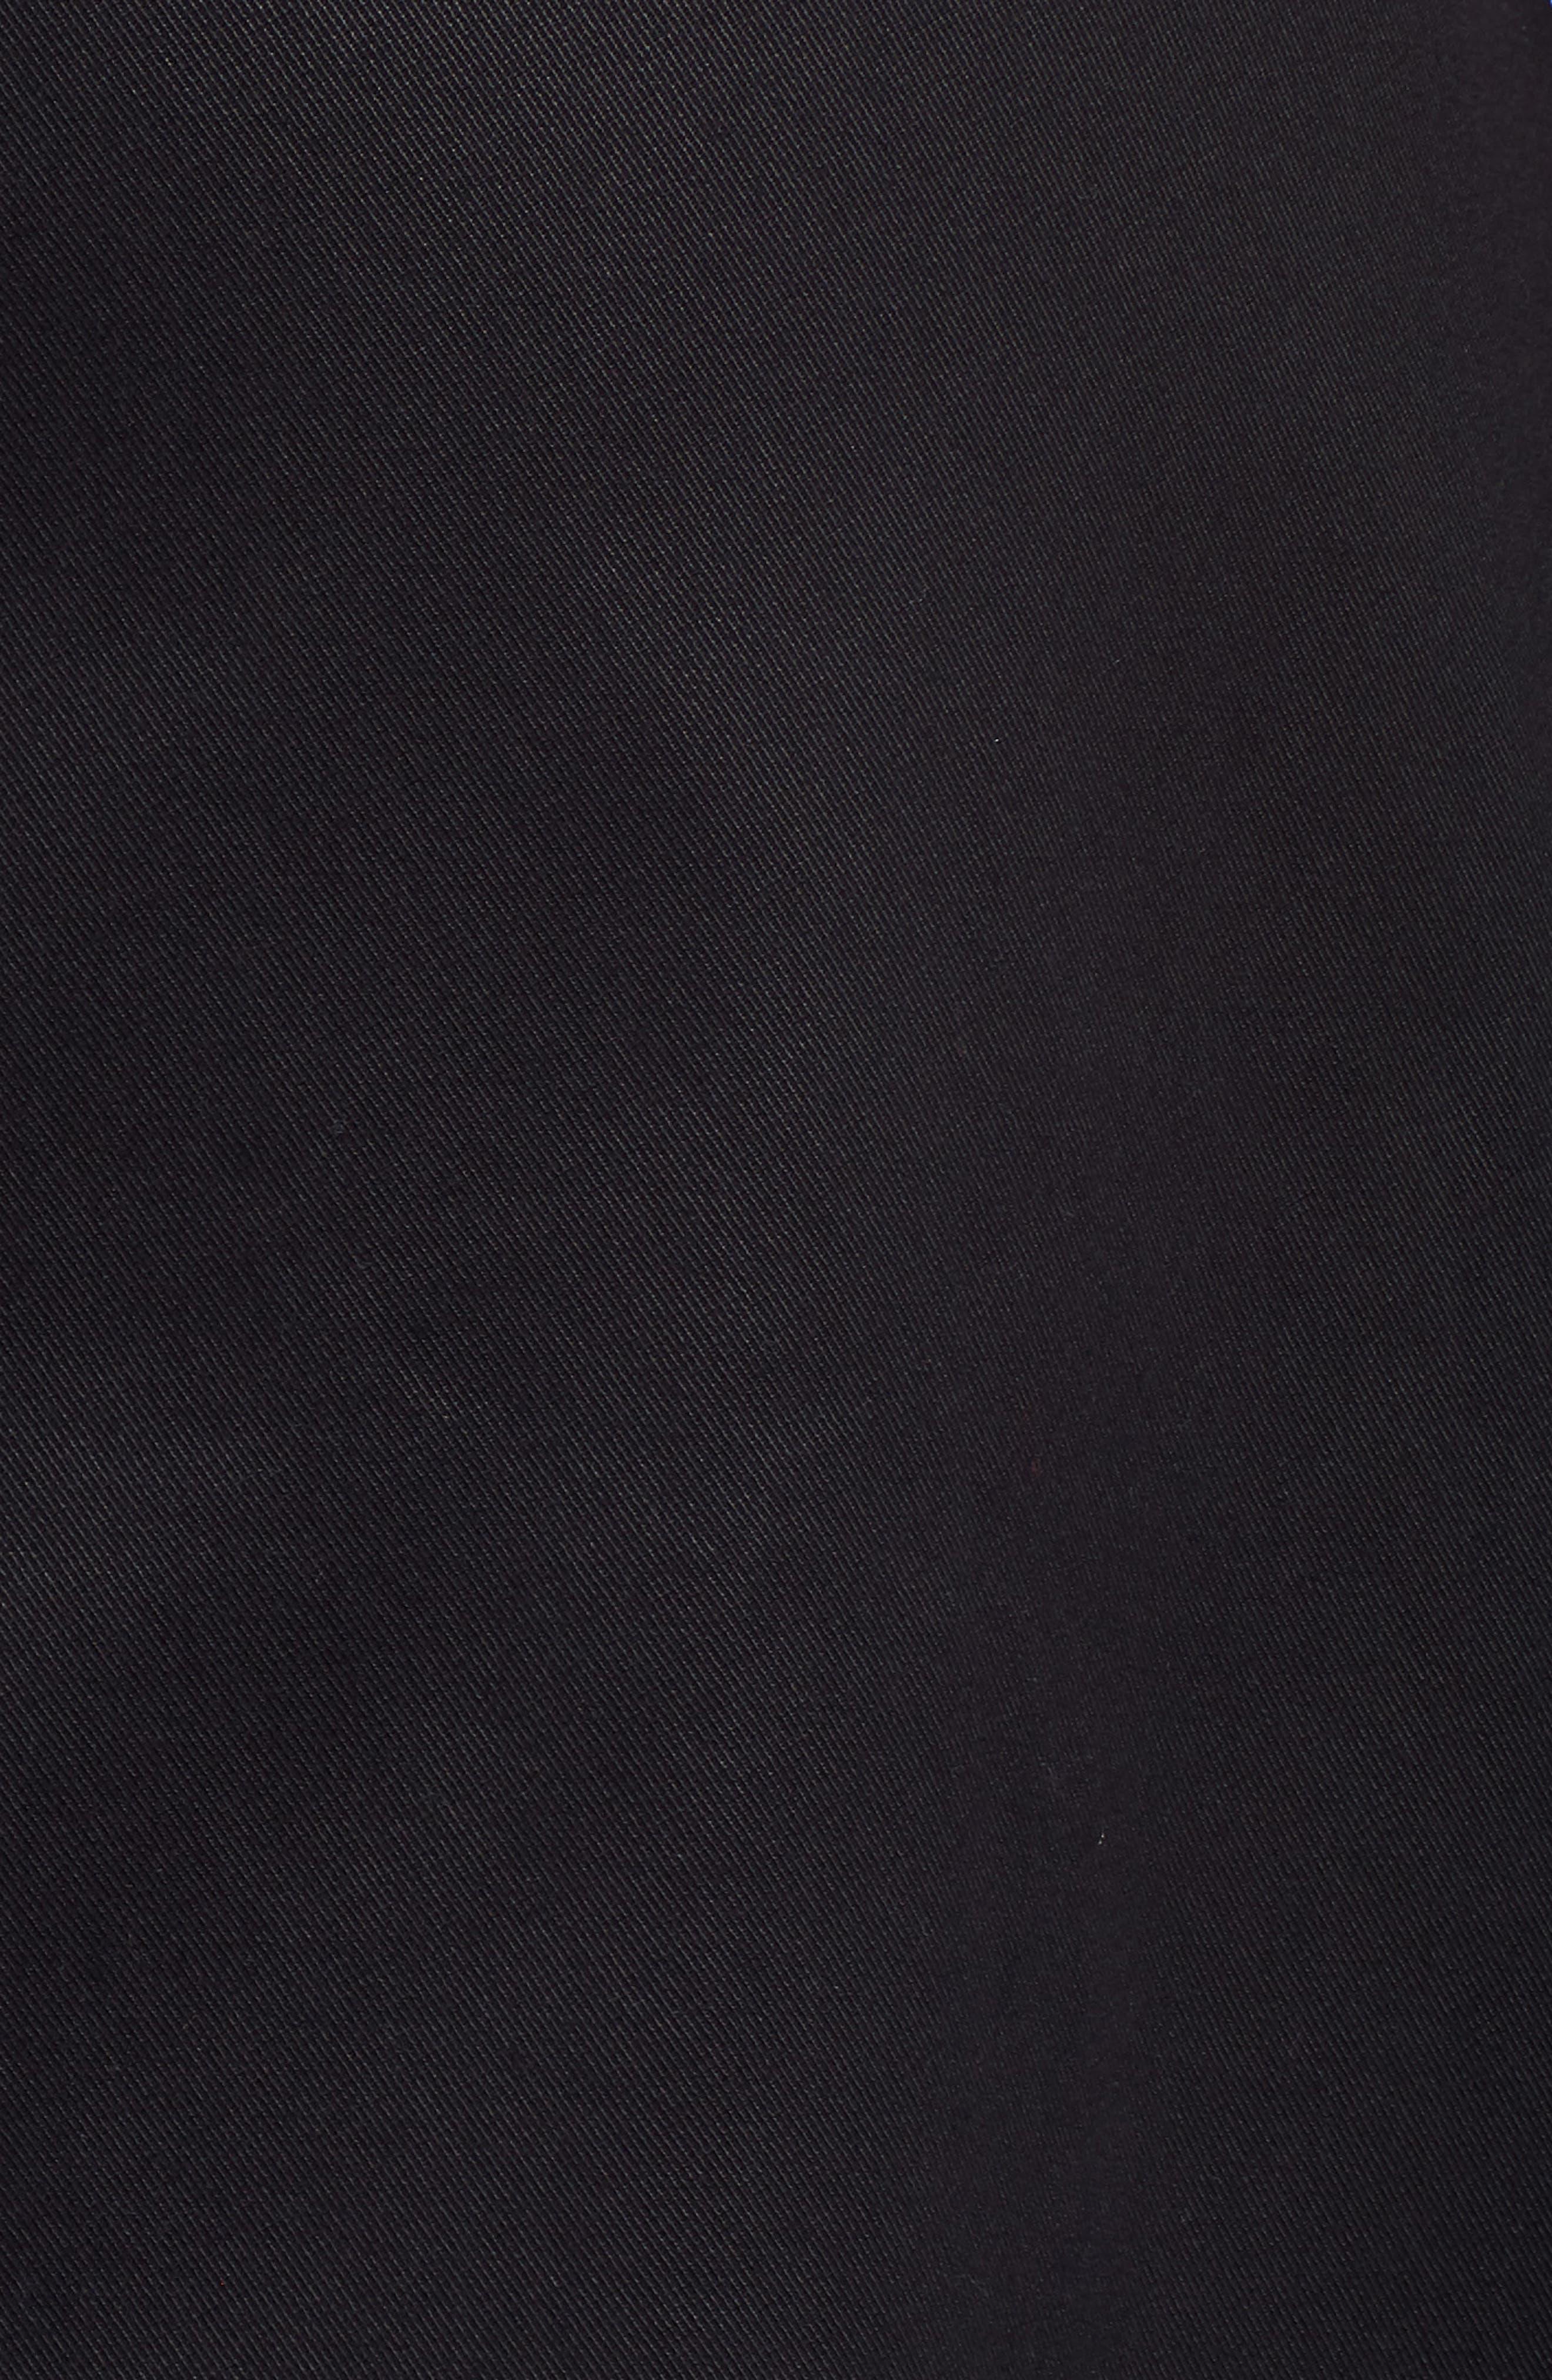 A-Line Midi Skirt,                             Alternate thumbnail 5, color,                             001